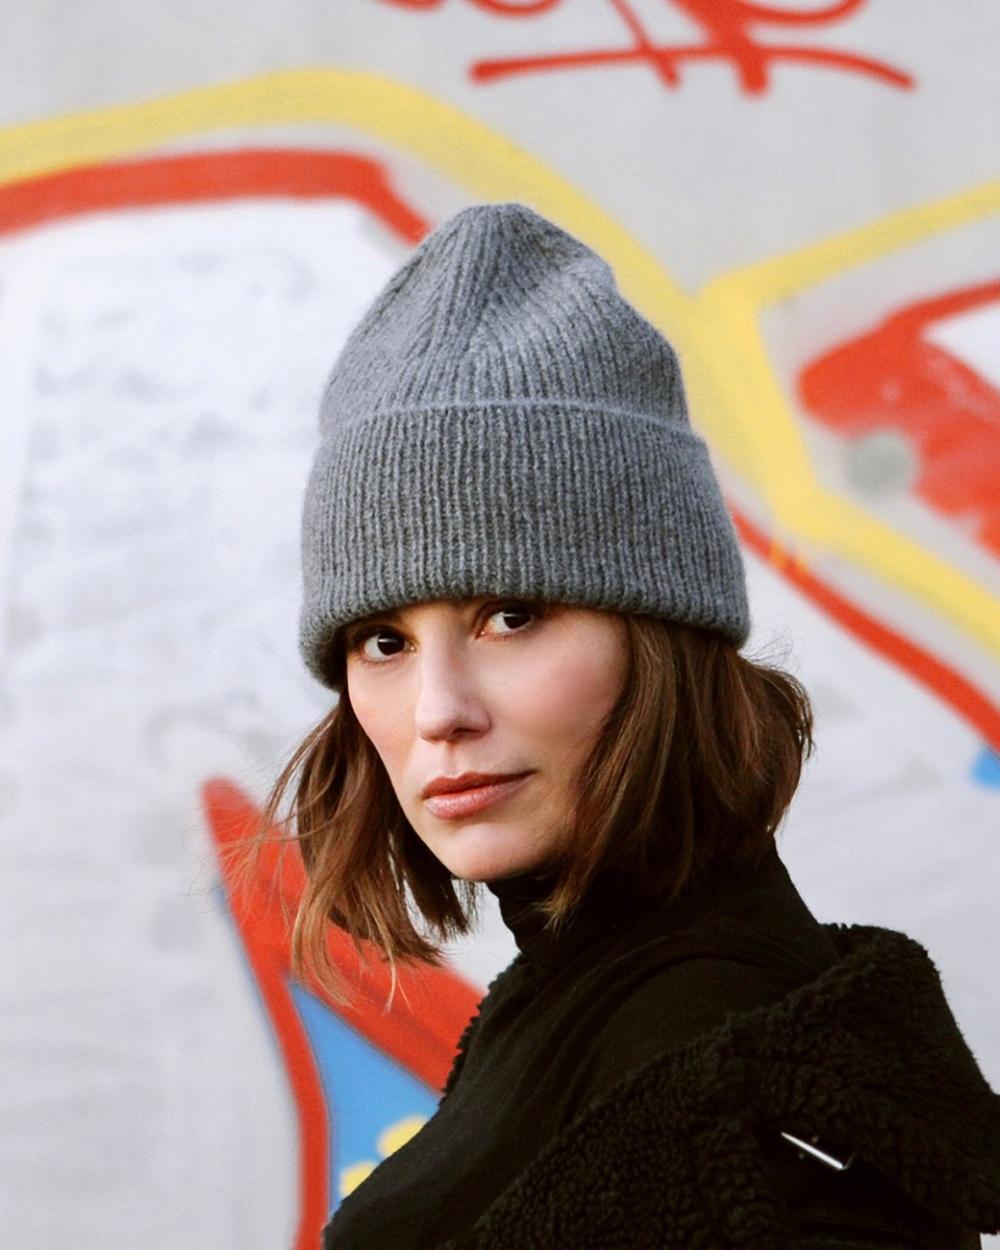 The Streetstyler Hat